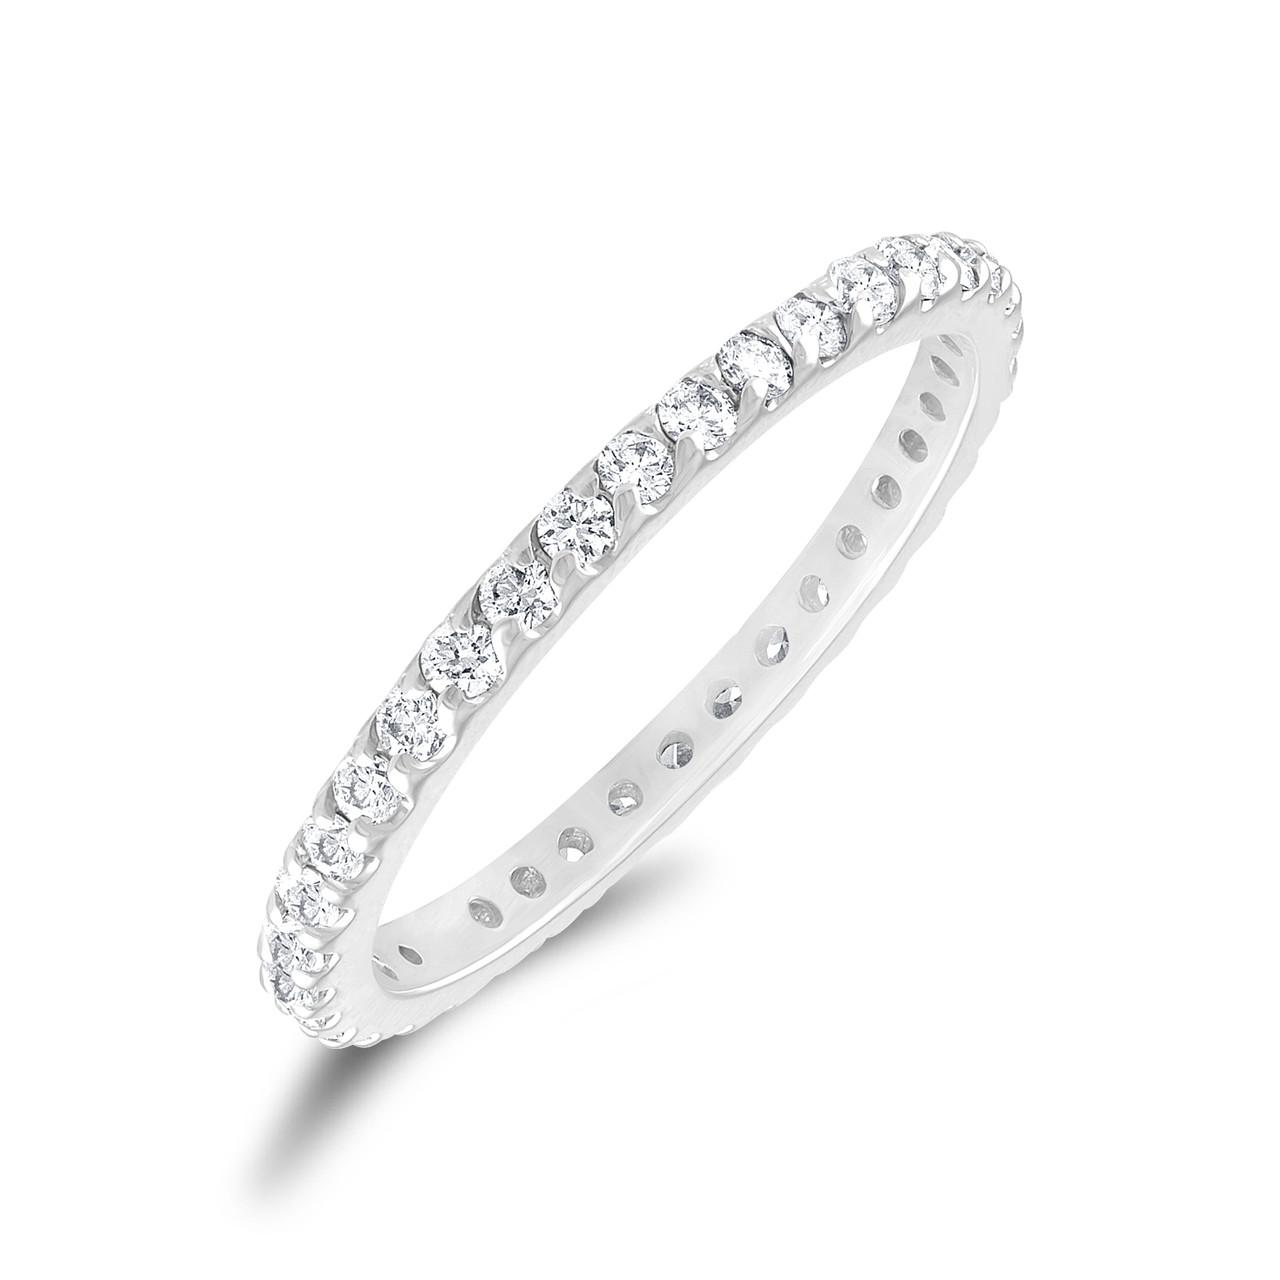 0.56 Carat Diamond Eternity Ring 8635b3dbf